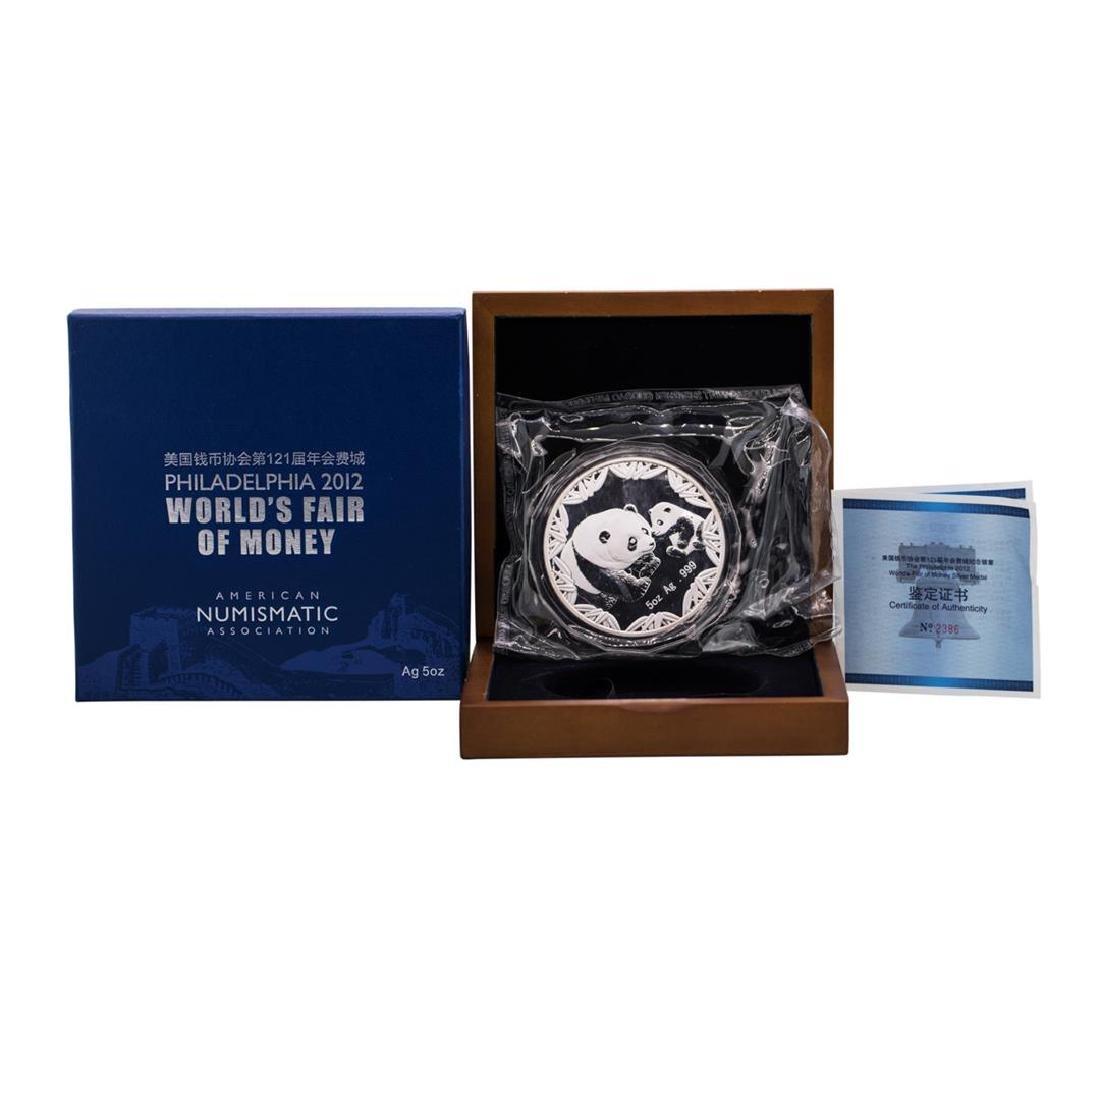 2012 Philadelphia World's Fair of Money 5 oz. Silver